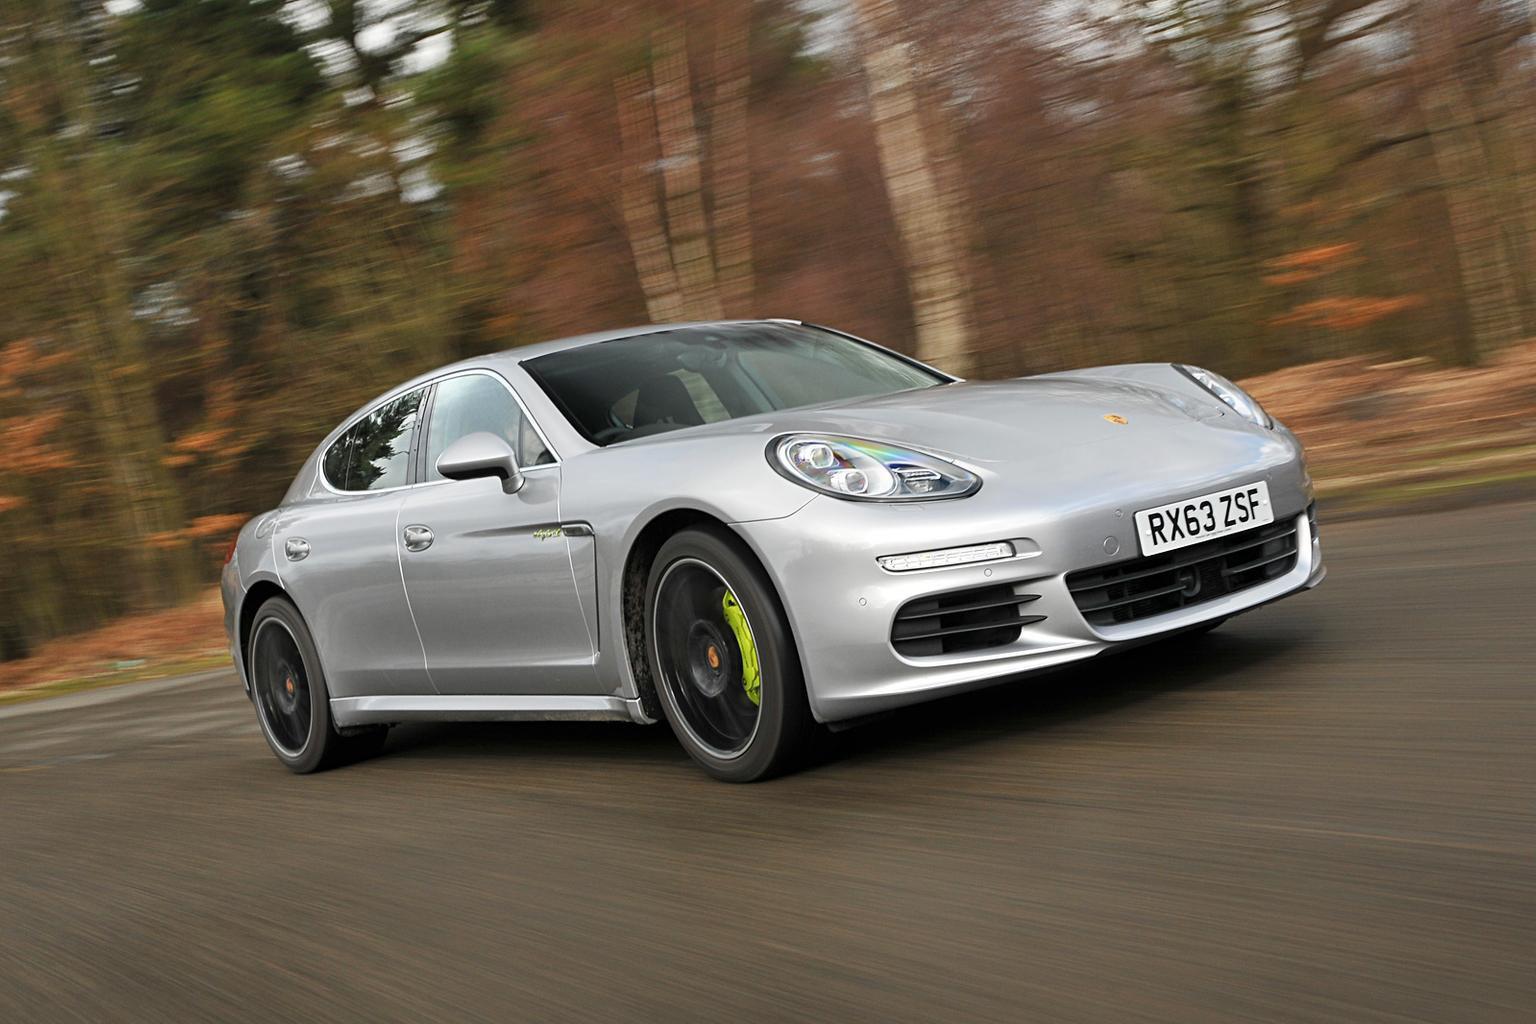 2017 Porsche Panamera S E Hybrid Review